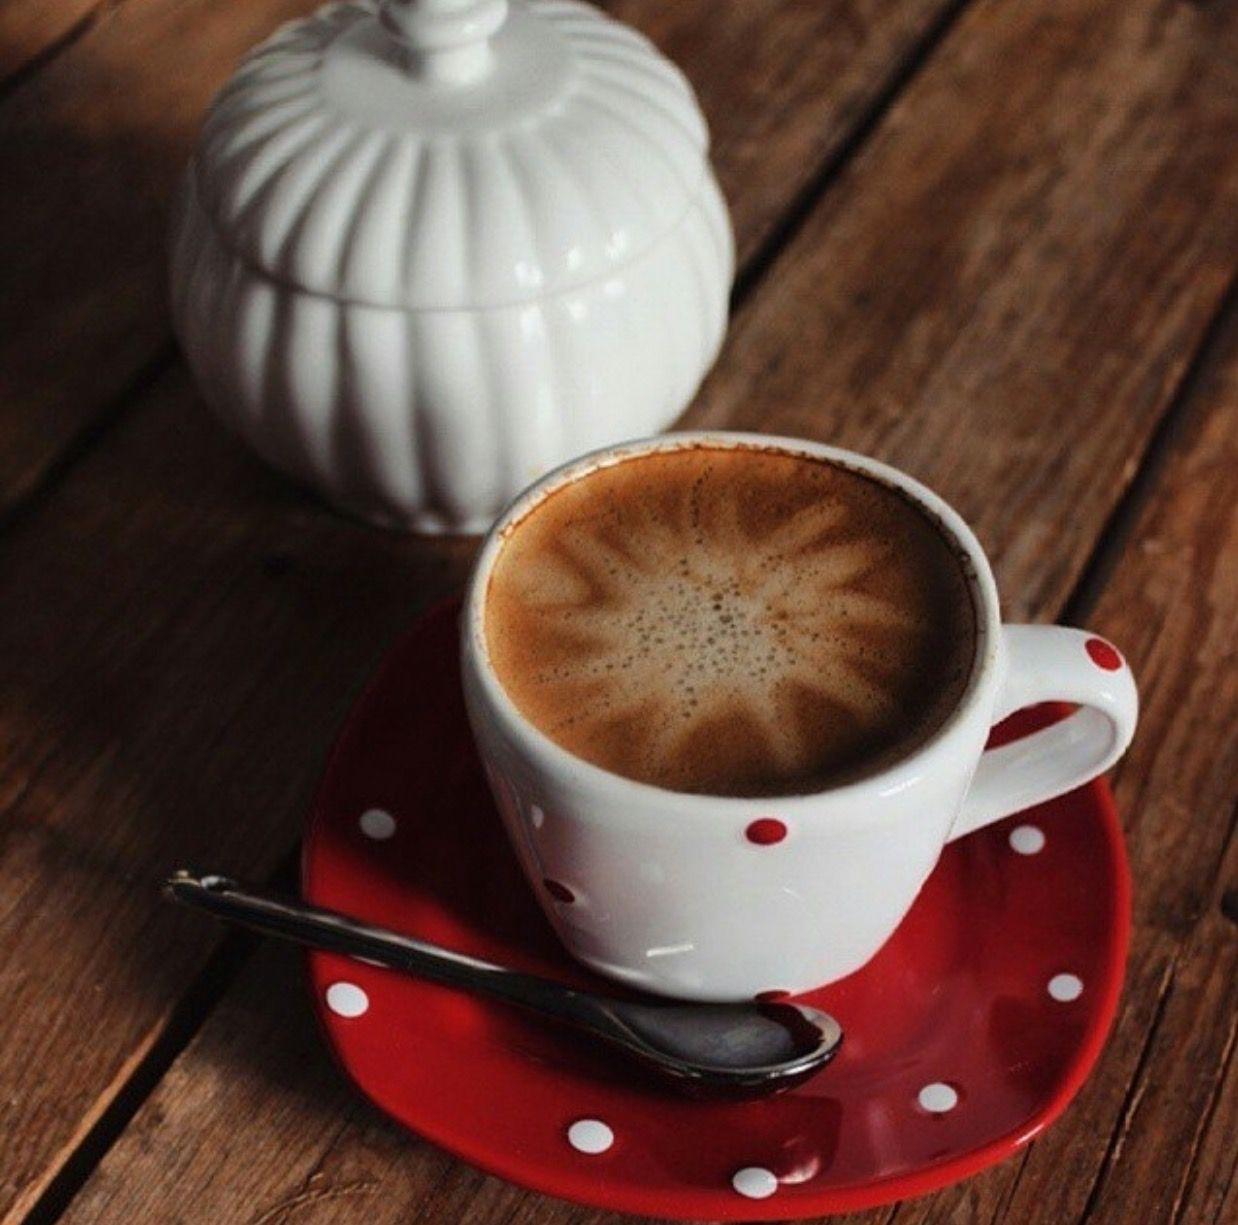 Pin by XRISATAN on coffee lovers Coffee facts, Starbucks